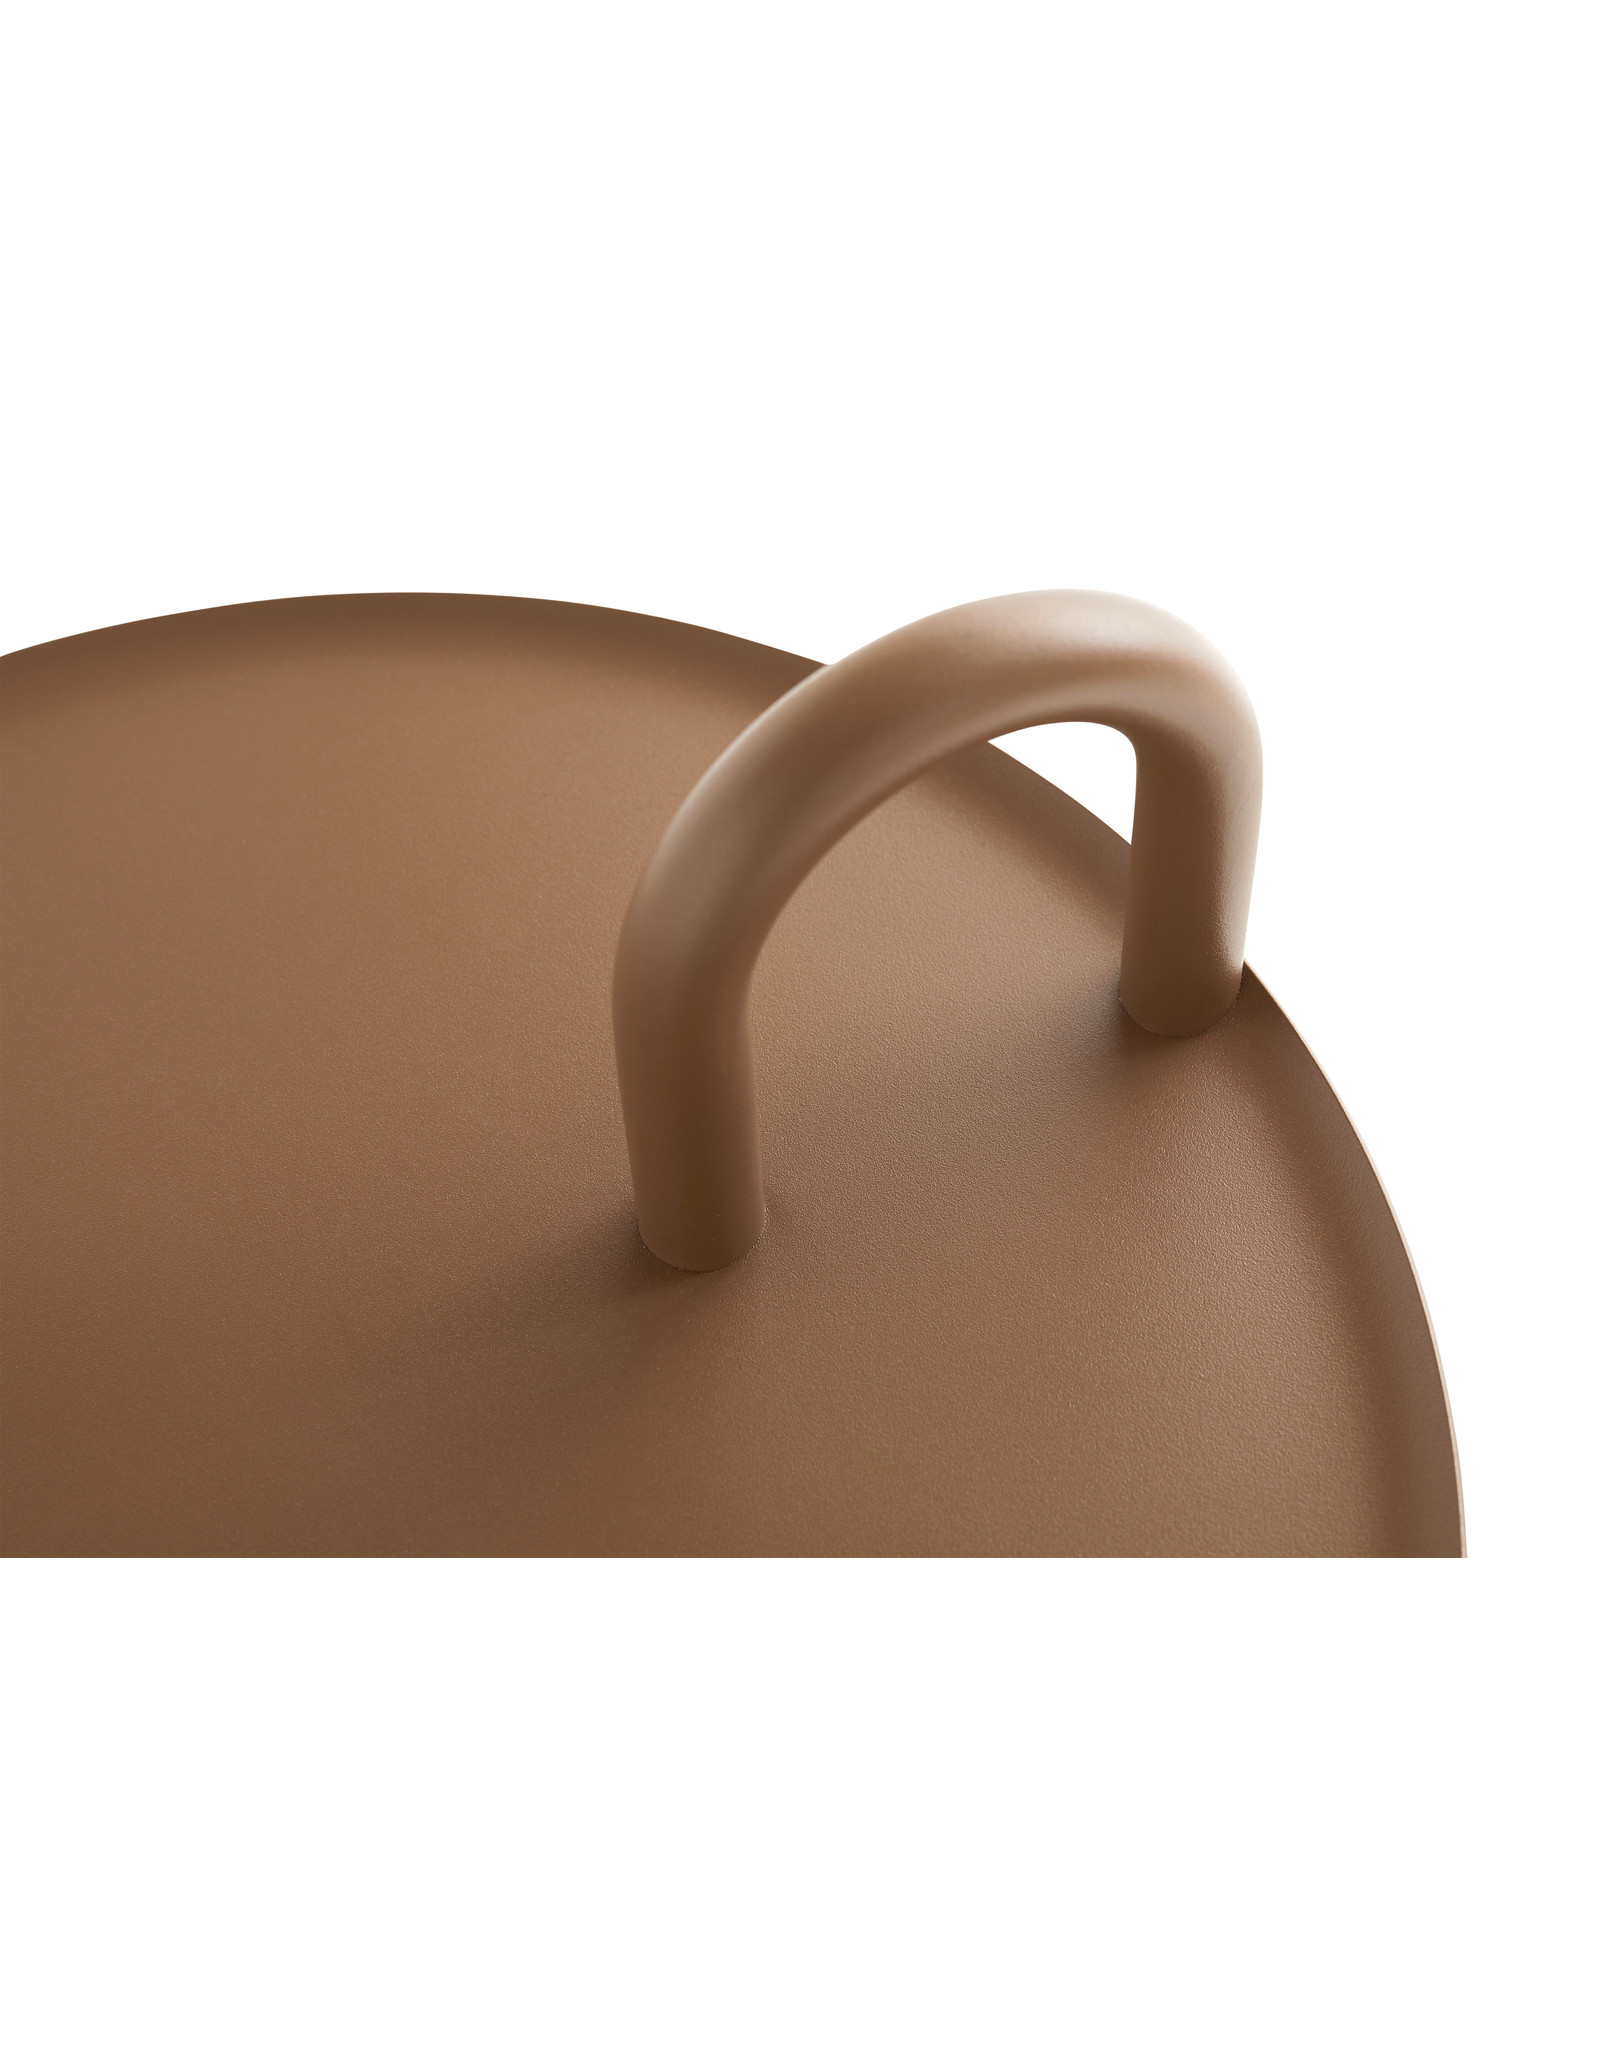 HAY Bowler / Side Table Pale Brown